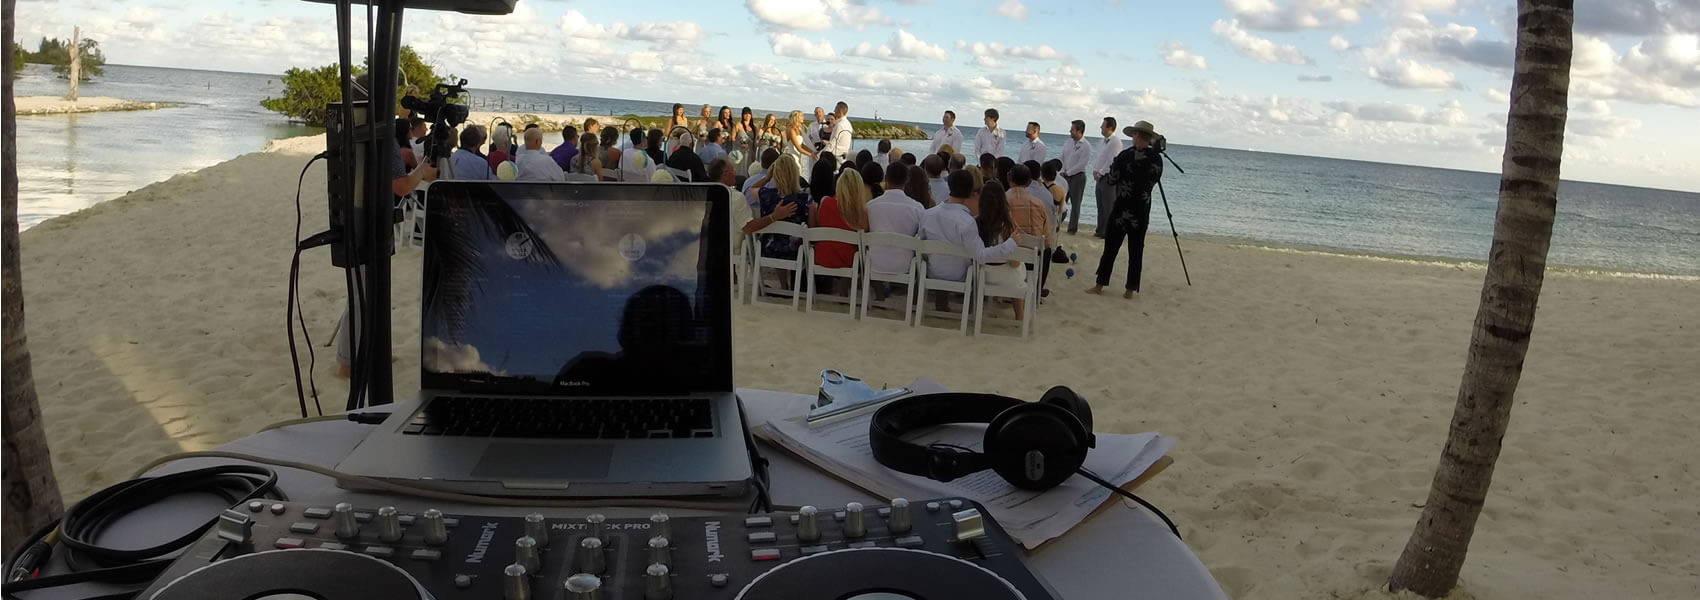 Uno Audio Visual - Ceremony equipment